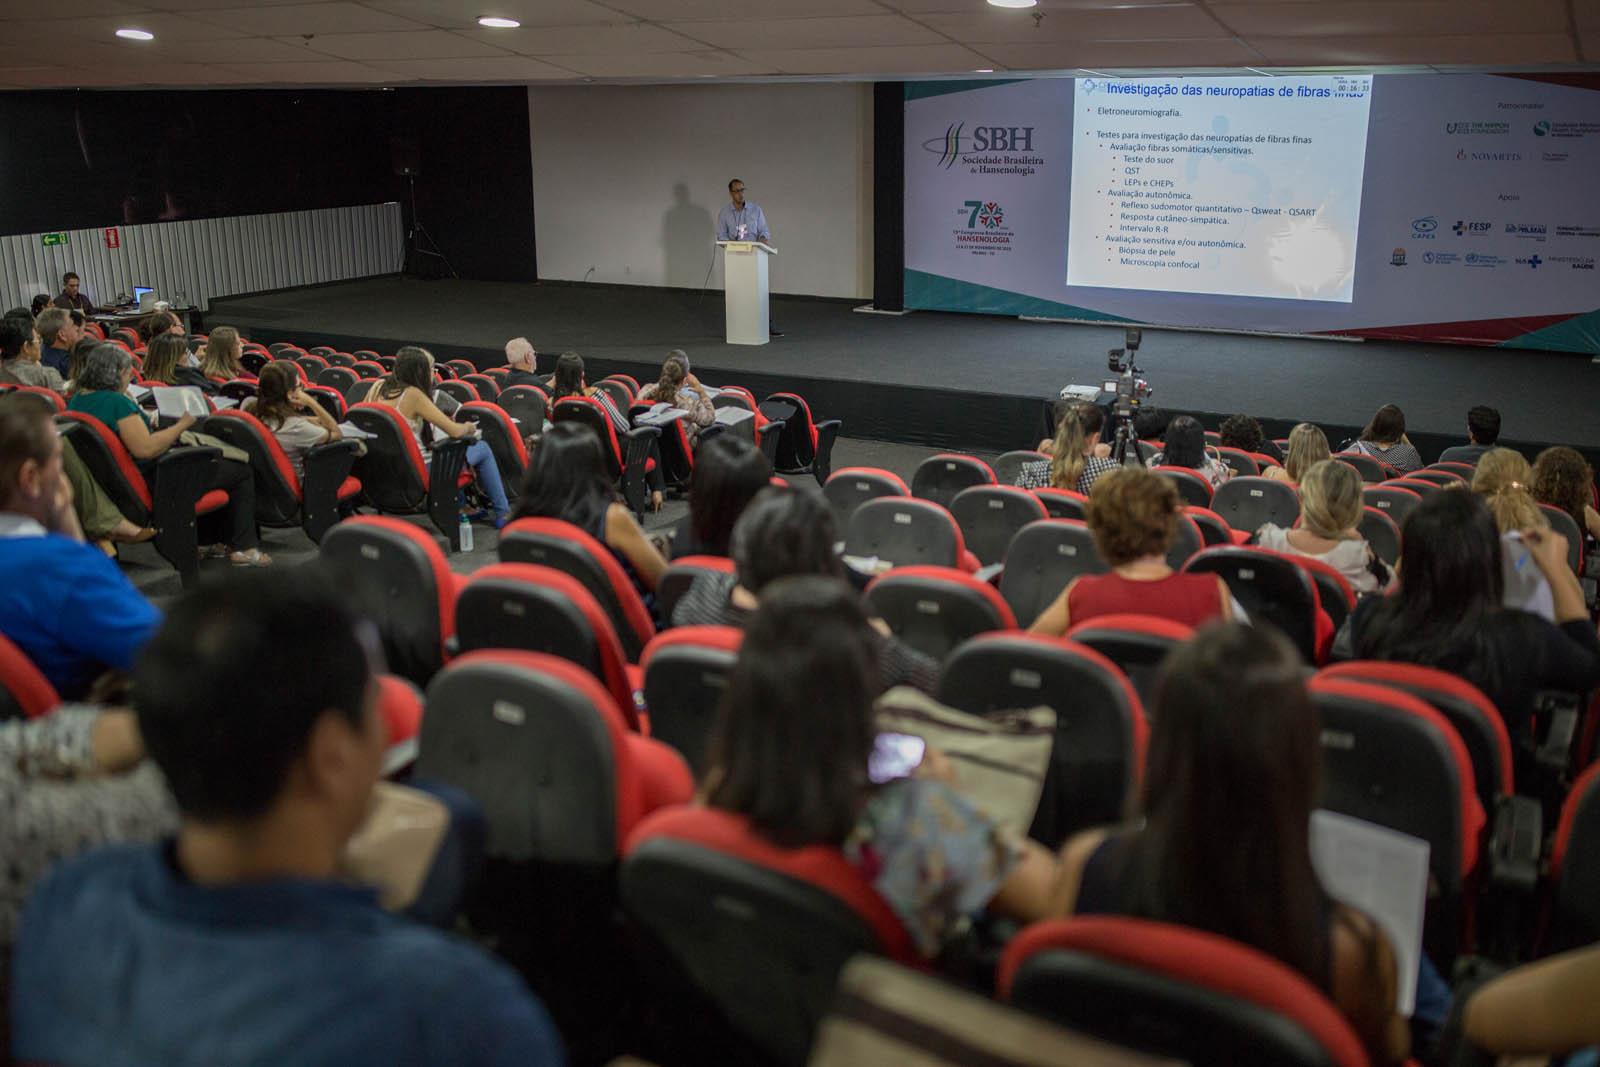 Profissionais abordam desafios e novas abordagens para o diagnóstico preciso da hanseníase